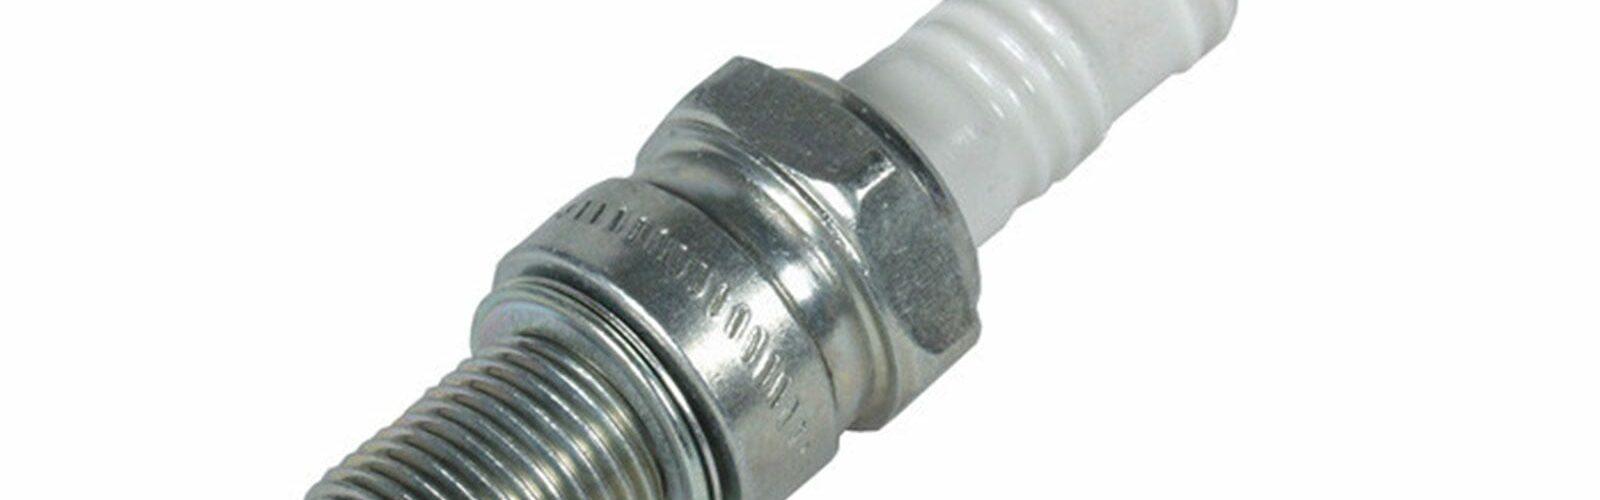 Best Spark Plugs for 5.7 Vortec